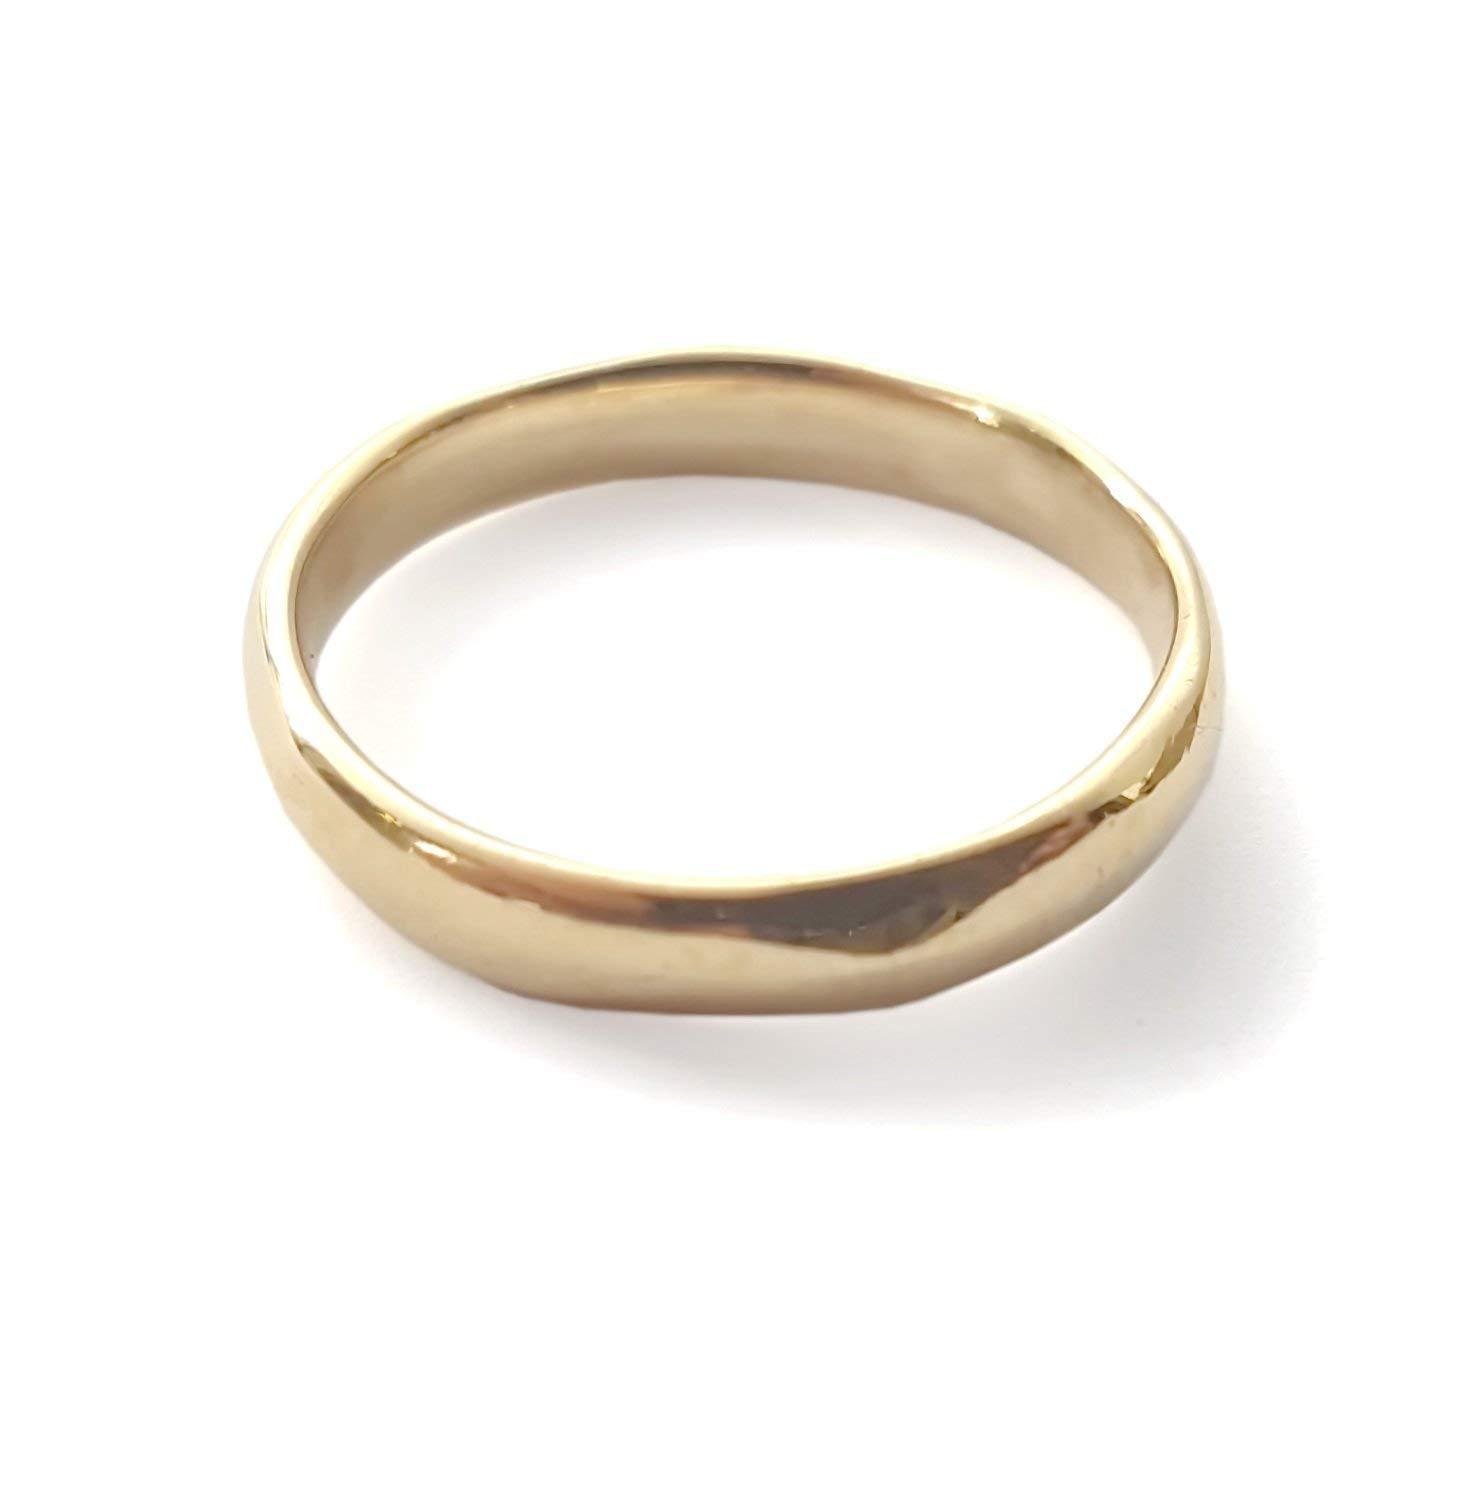 Thin gold band, Simple wedding band, shiny wedding ring, Durable ring, Classic band, Textured 14K gold band, handmade band, Men Woman Organic ring